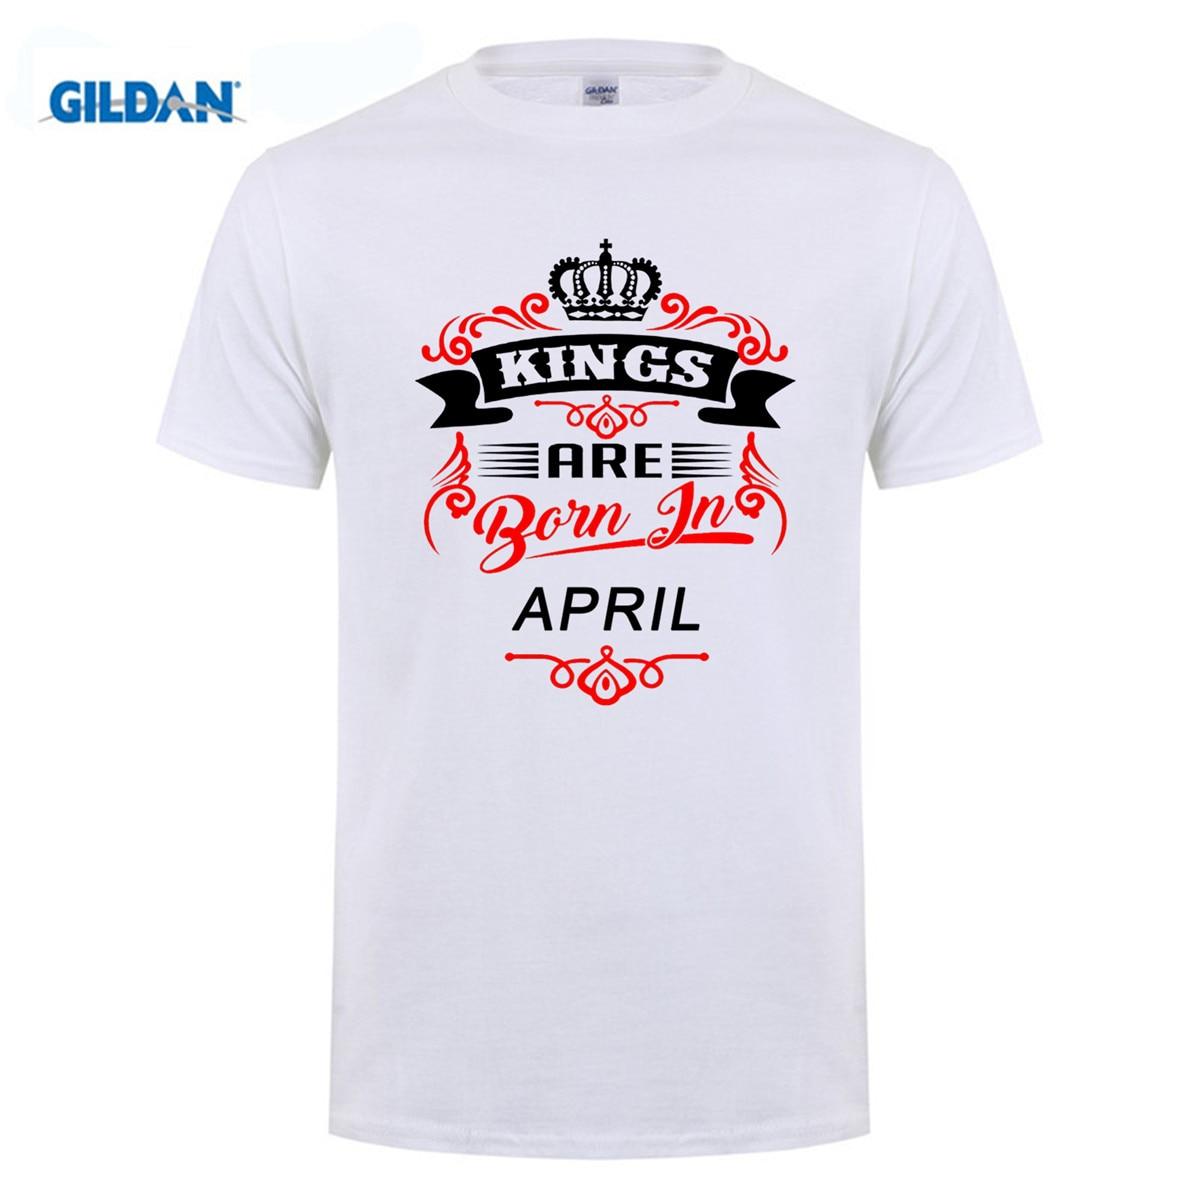 GILDAN Birthday T-shirt T Shirt Shop Online Crew Neck Men Short Sleeve Best Friend Kings Are Born In November Shirts